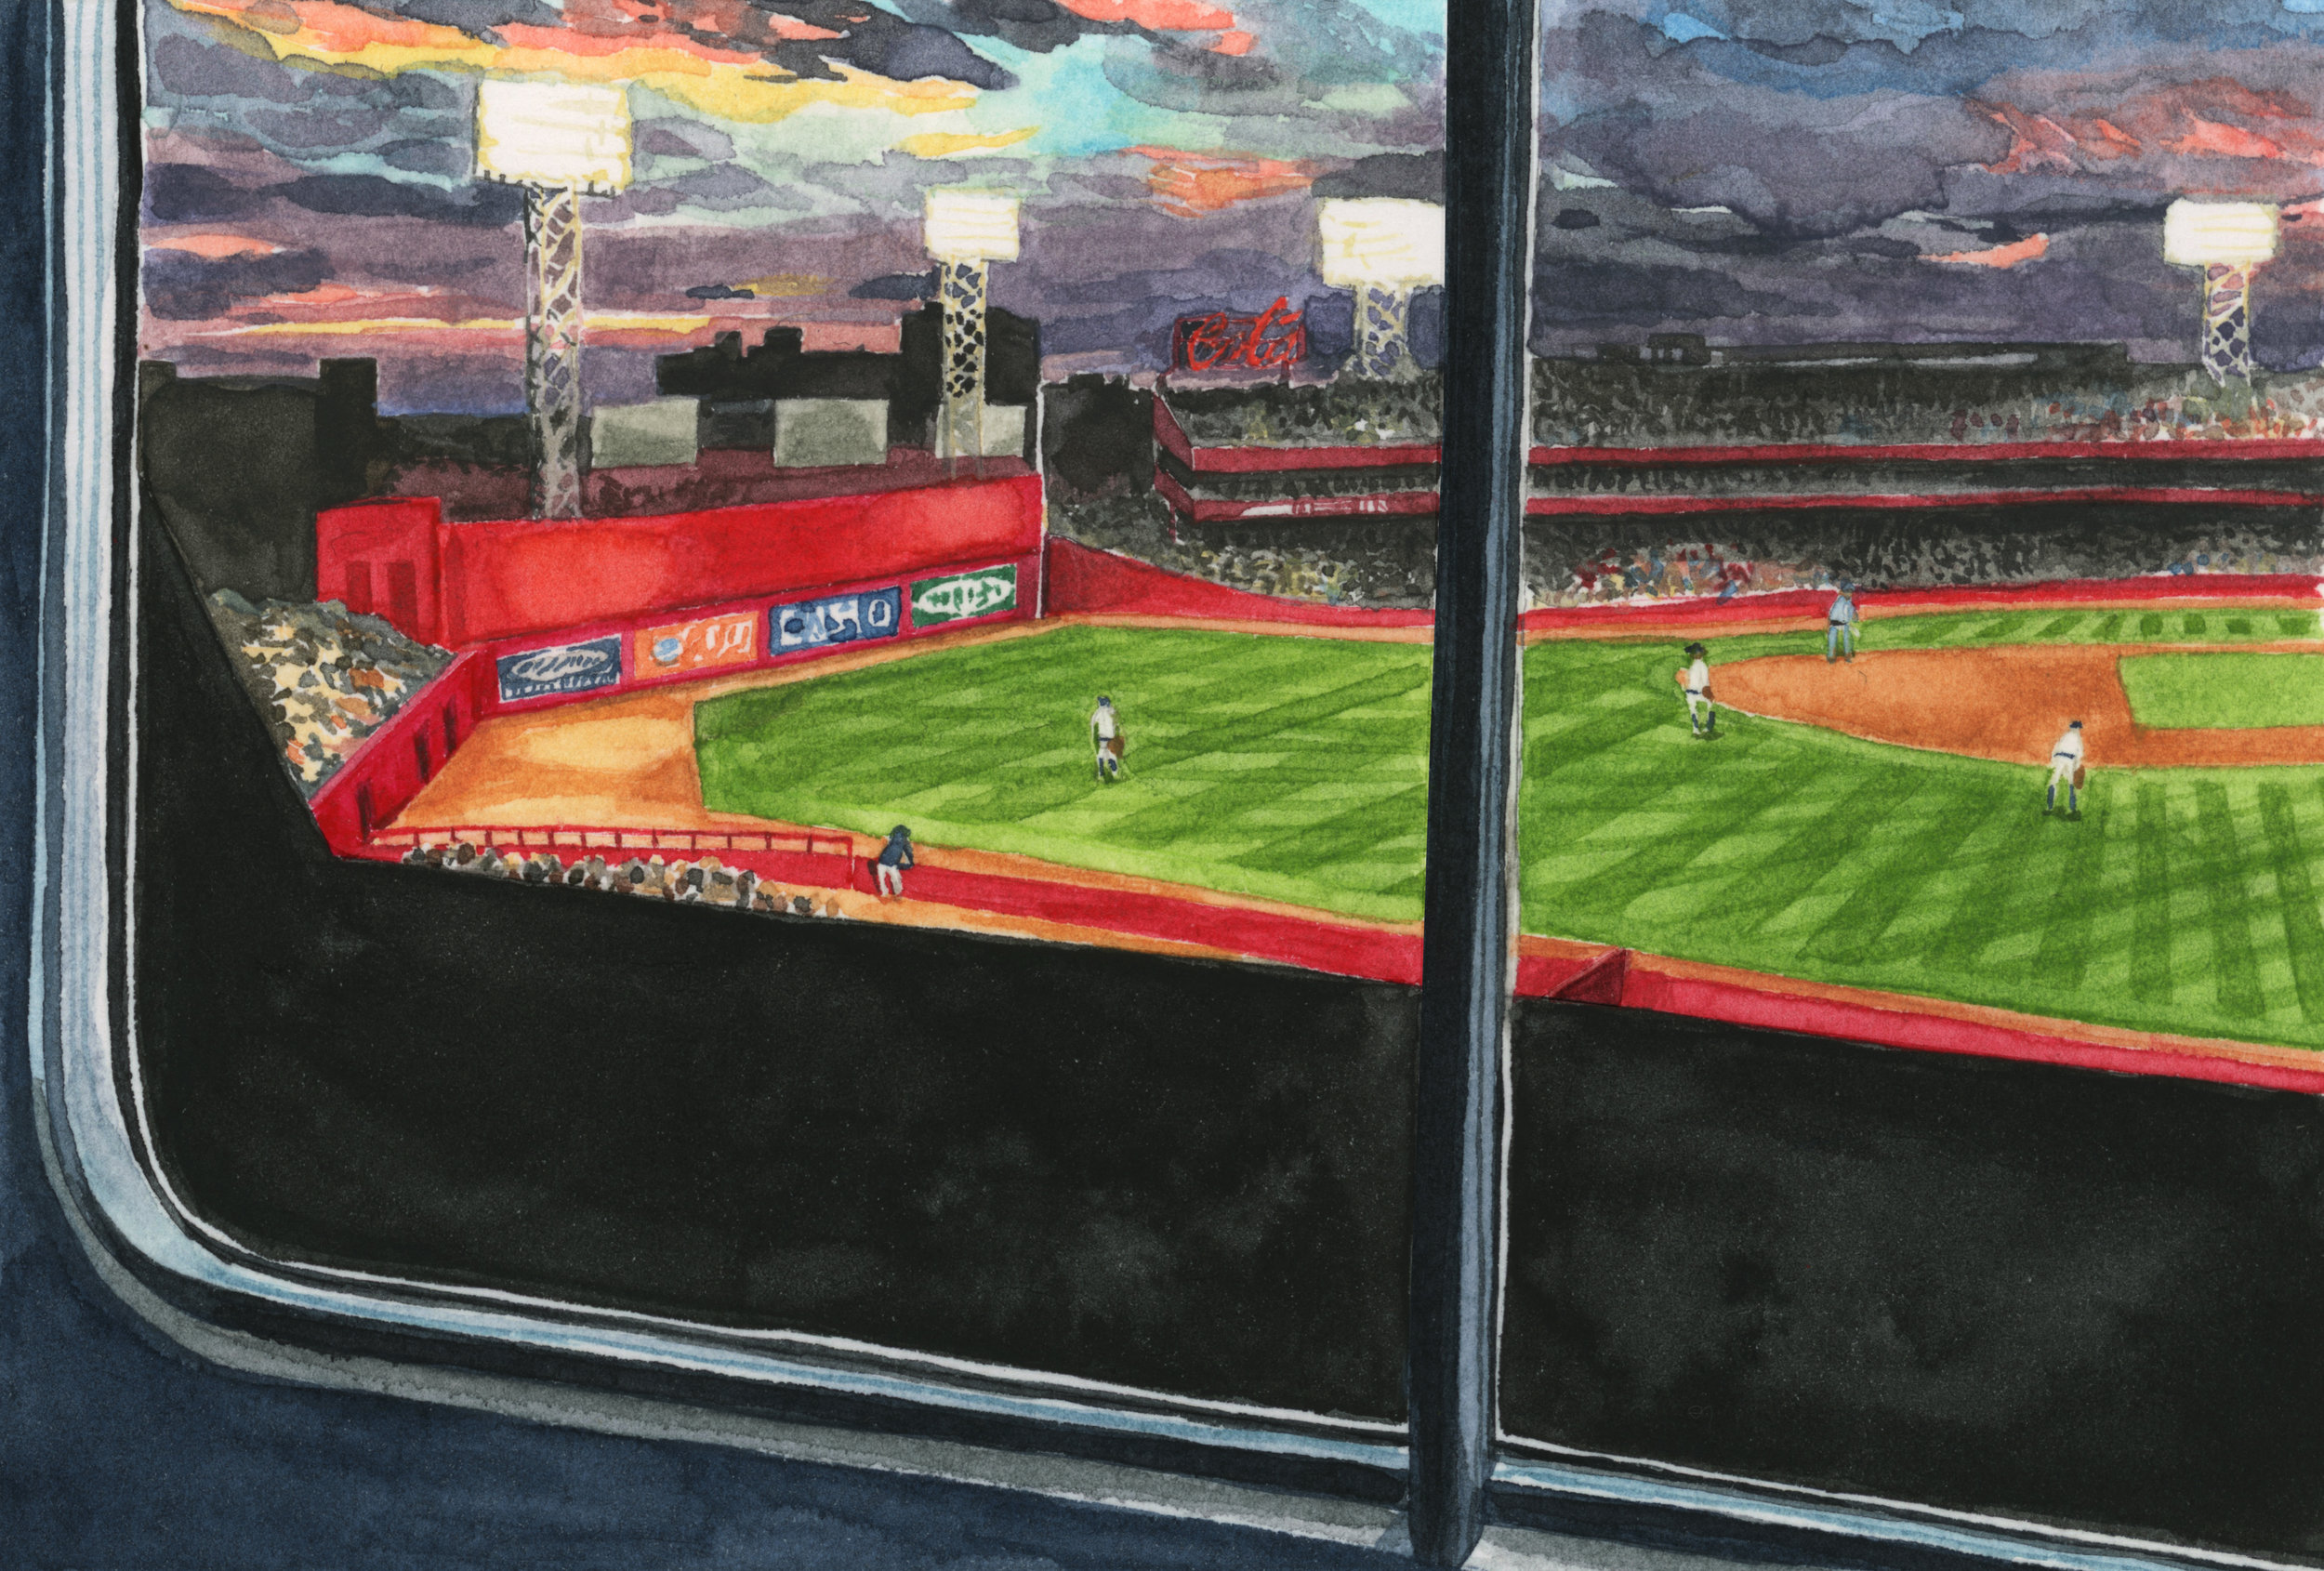 baseball-field-lrg.jpg